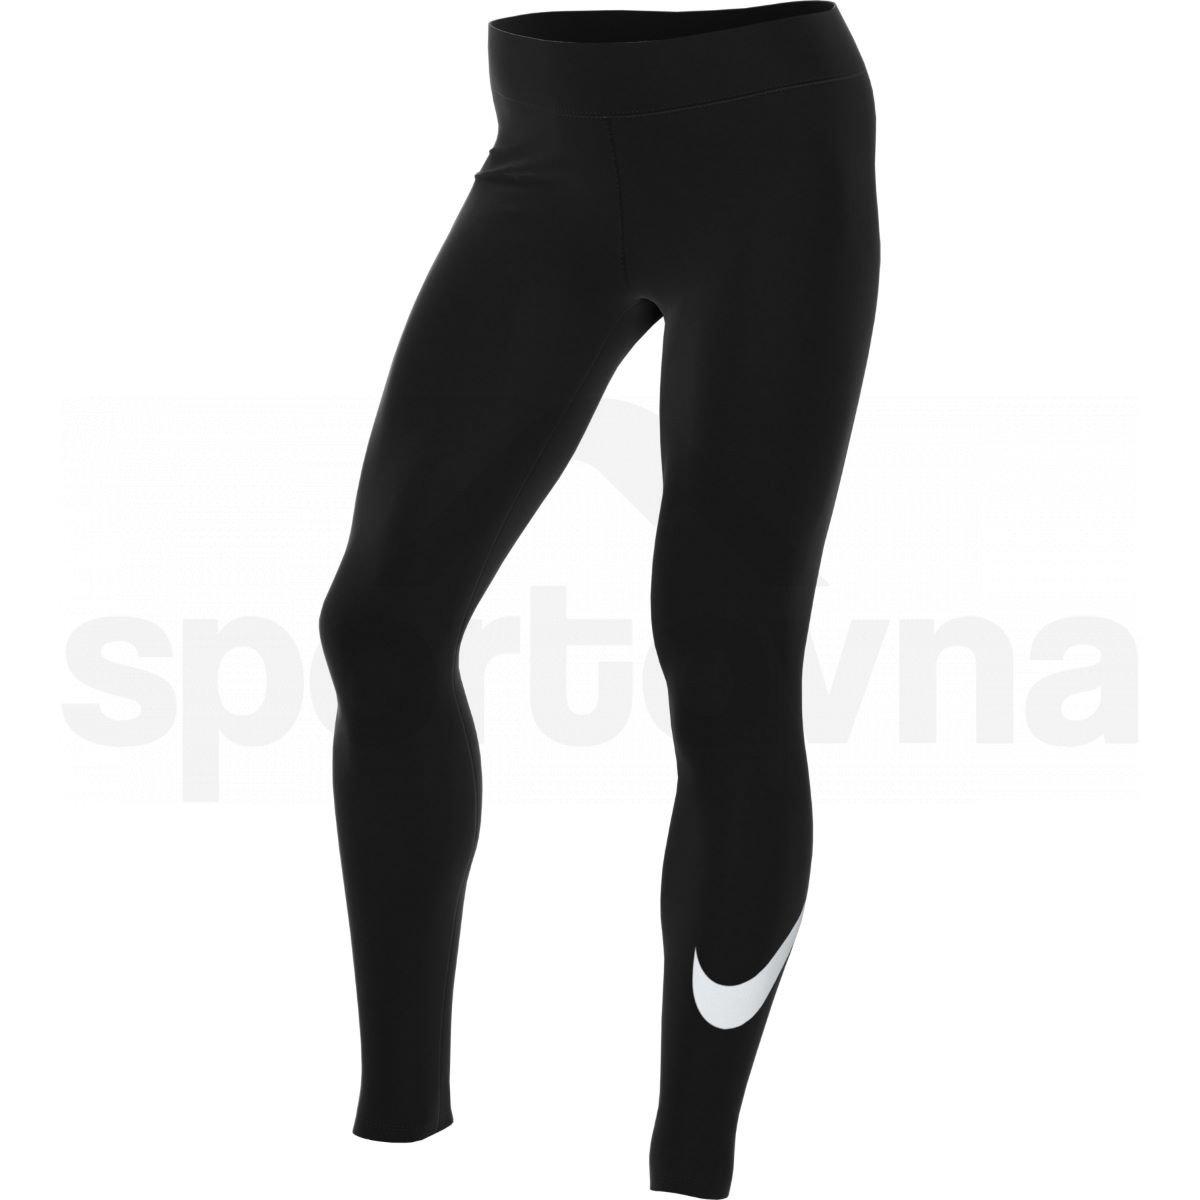 nike-sportswear-essential-mid-rise-swoosh-damen-leggings-black-white-cz8530-010-1-923858